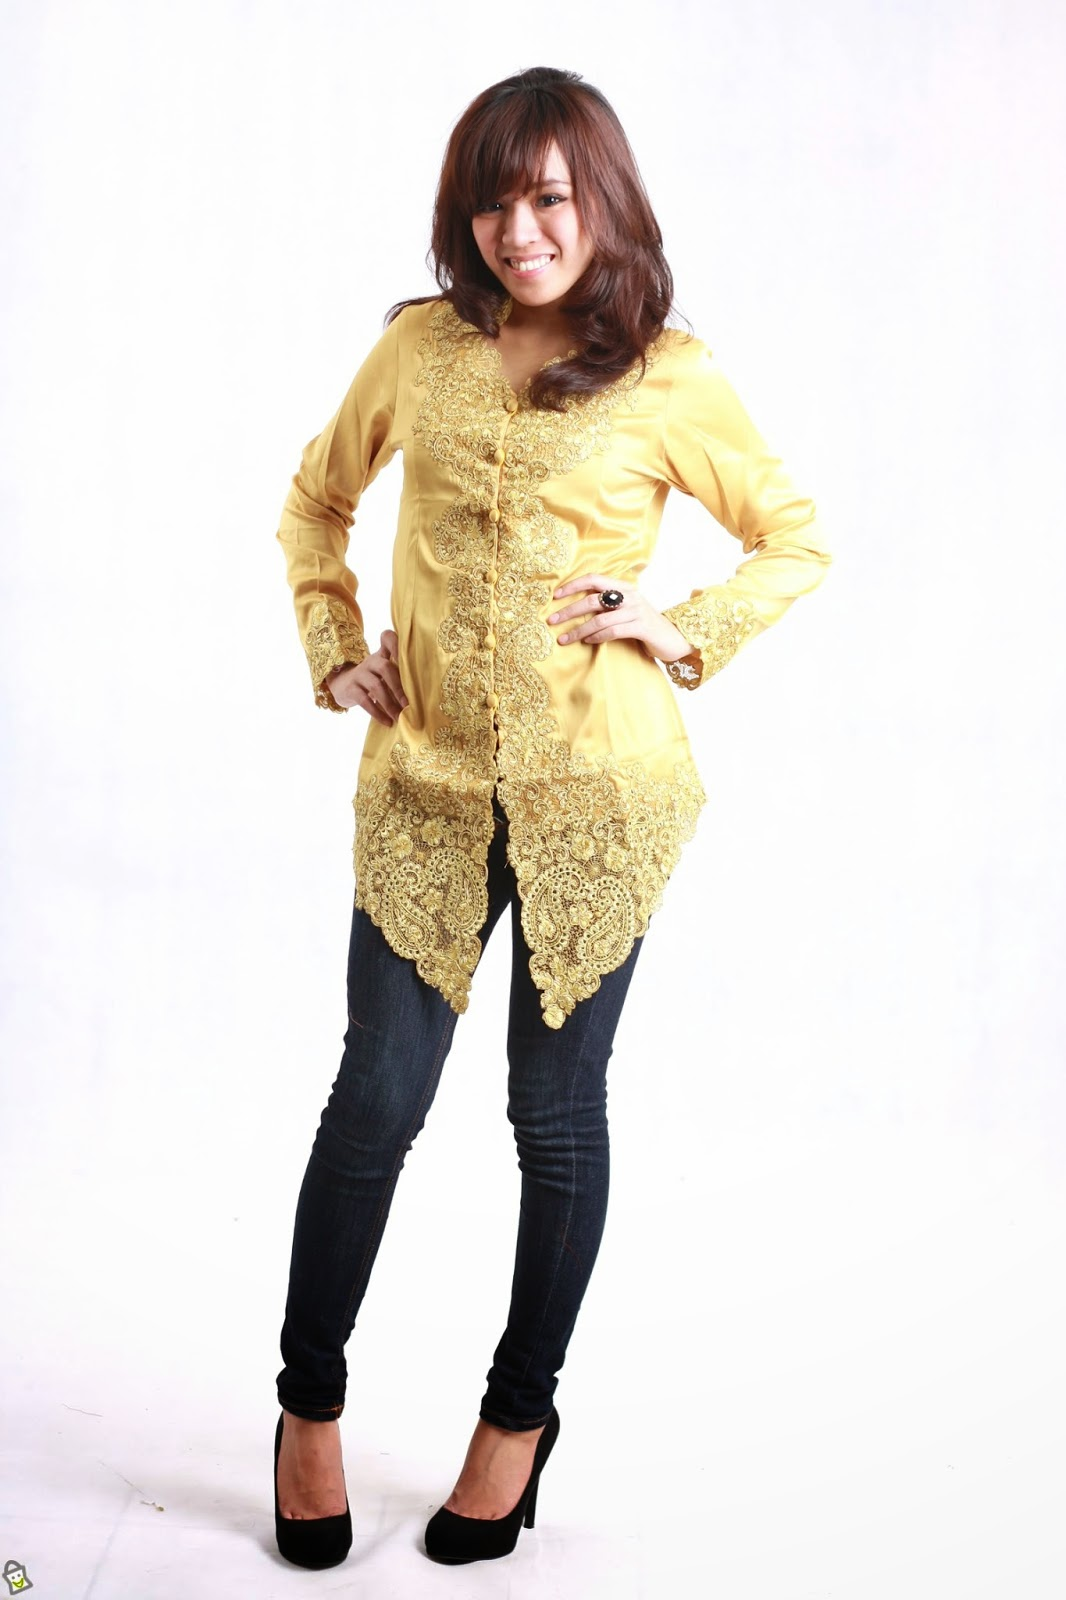 Trend Kebaya Remaja 2016 Model Berkebaya Anak Muda - Trend ...